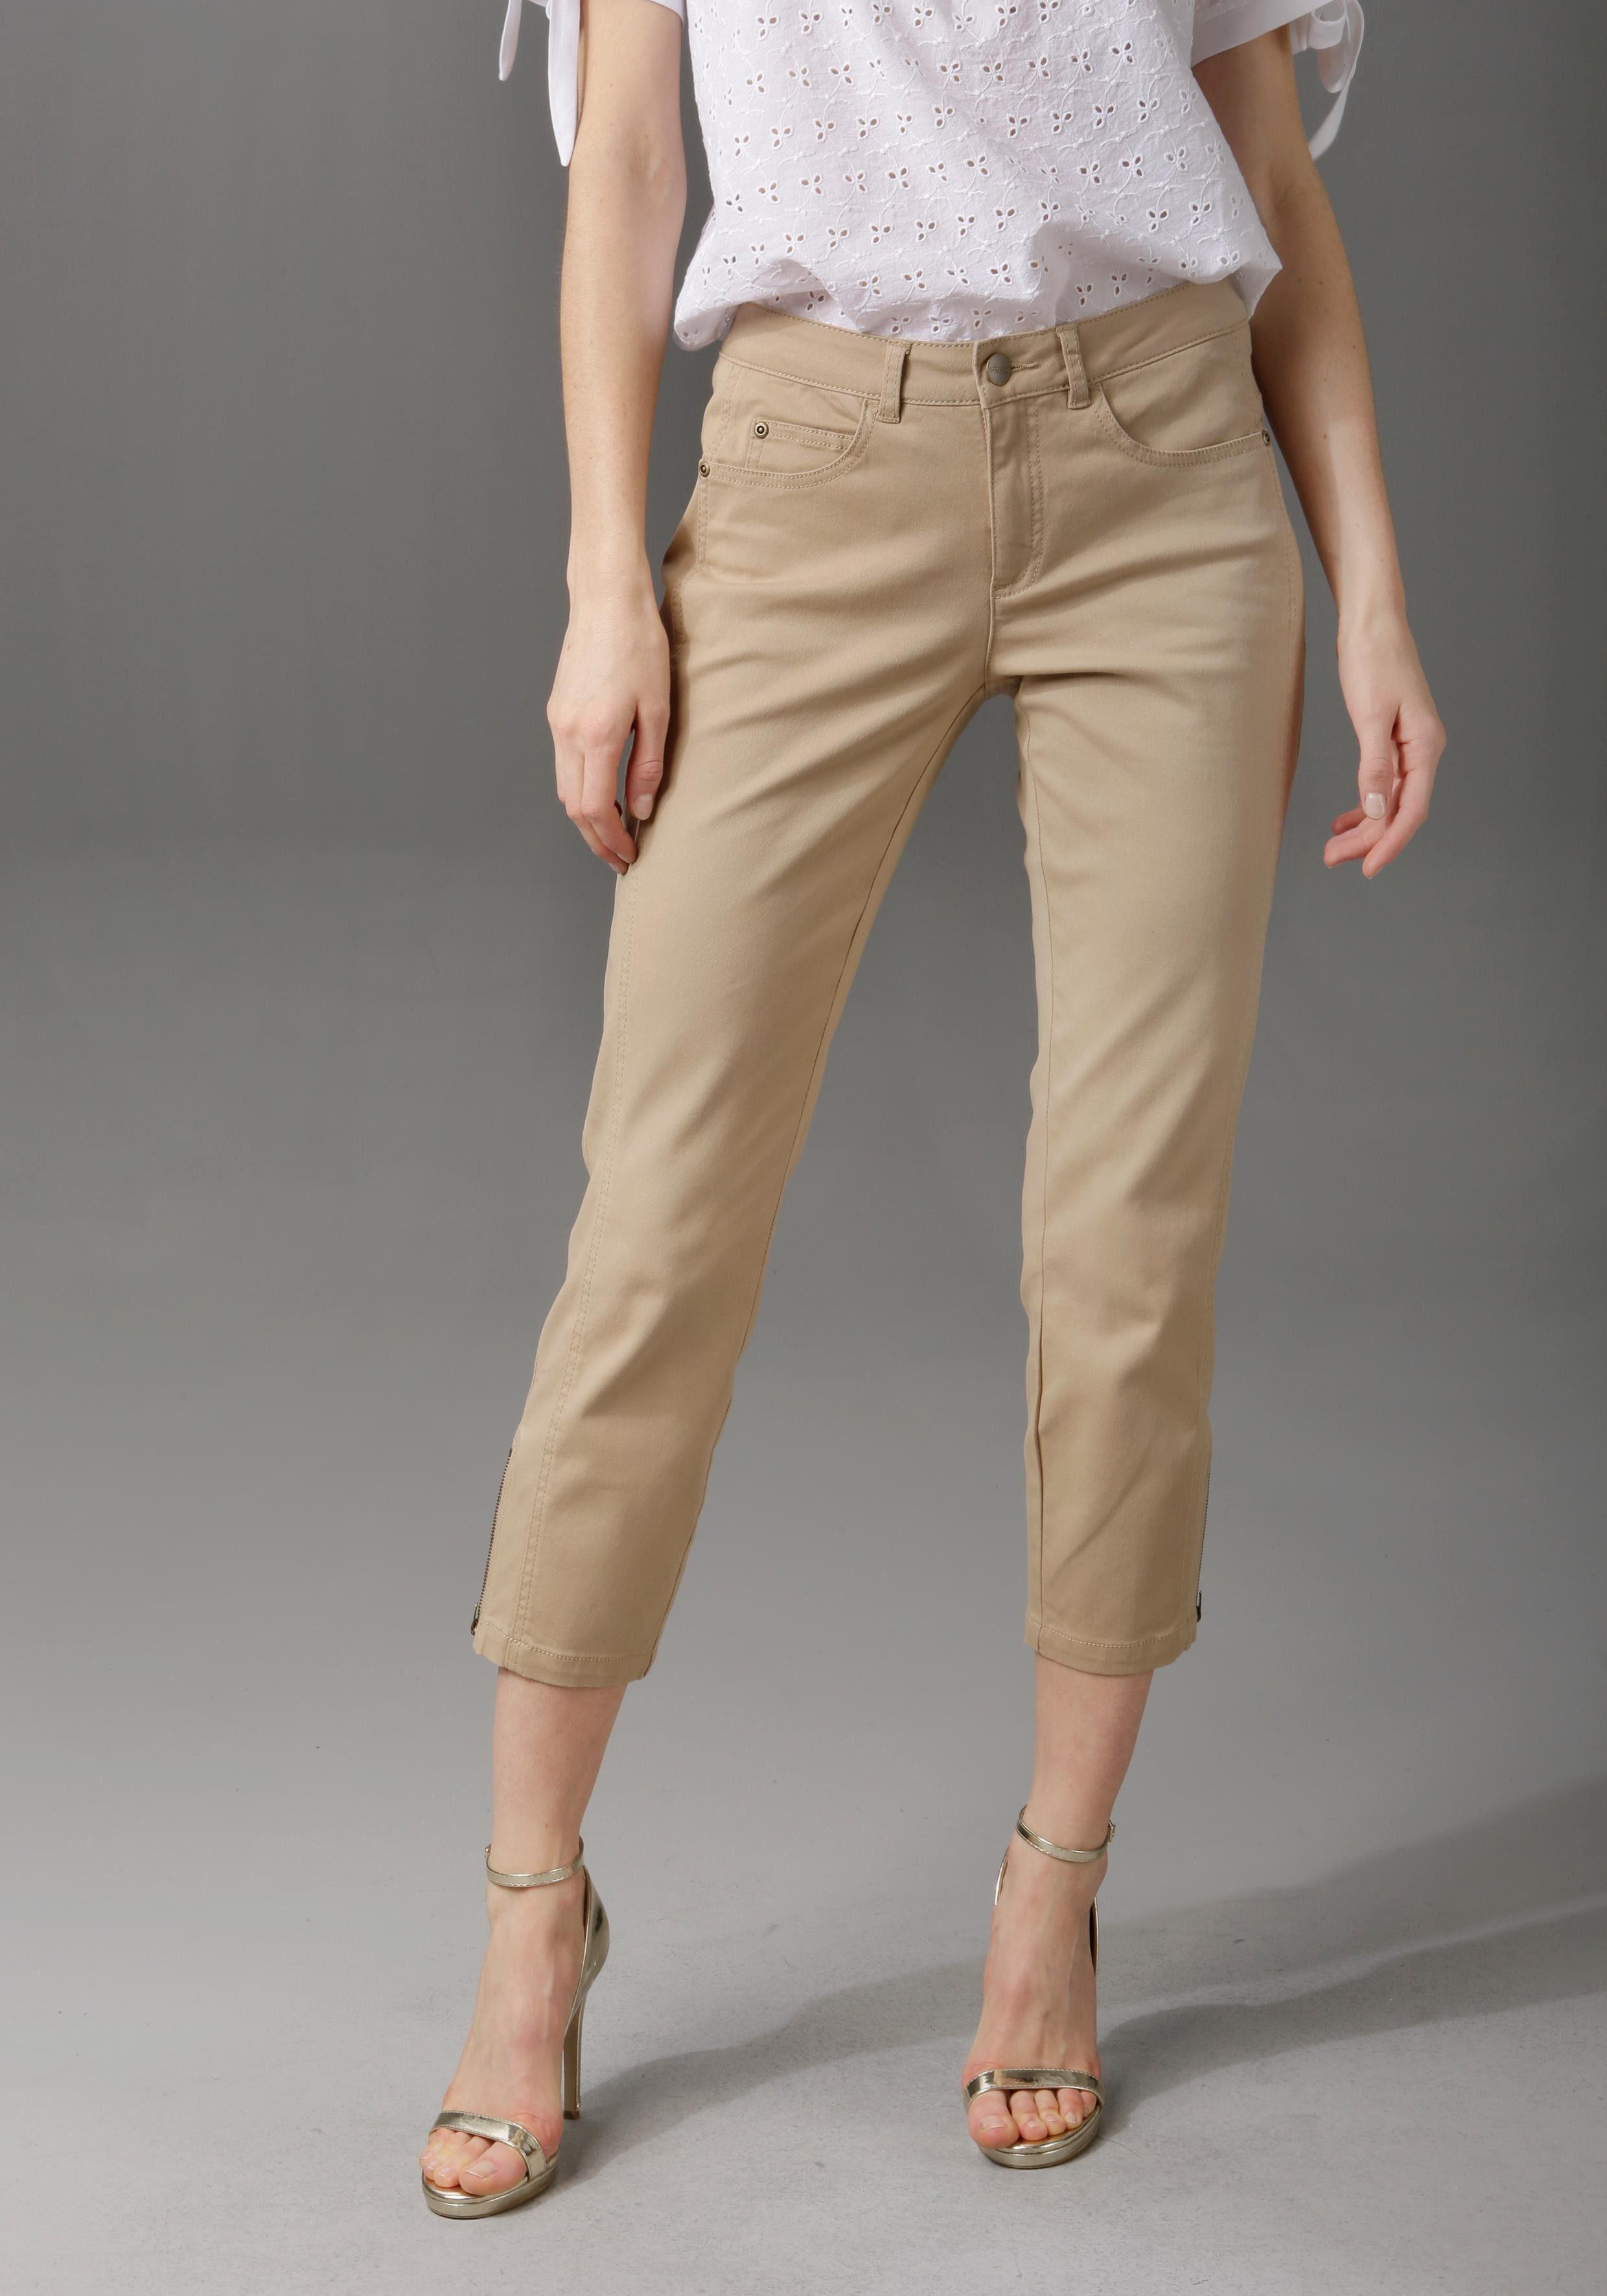 Image of Aniston CASUAL 7/8-Hose, mit Teilungsnähten